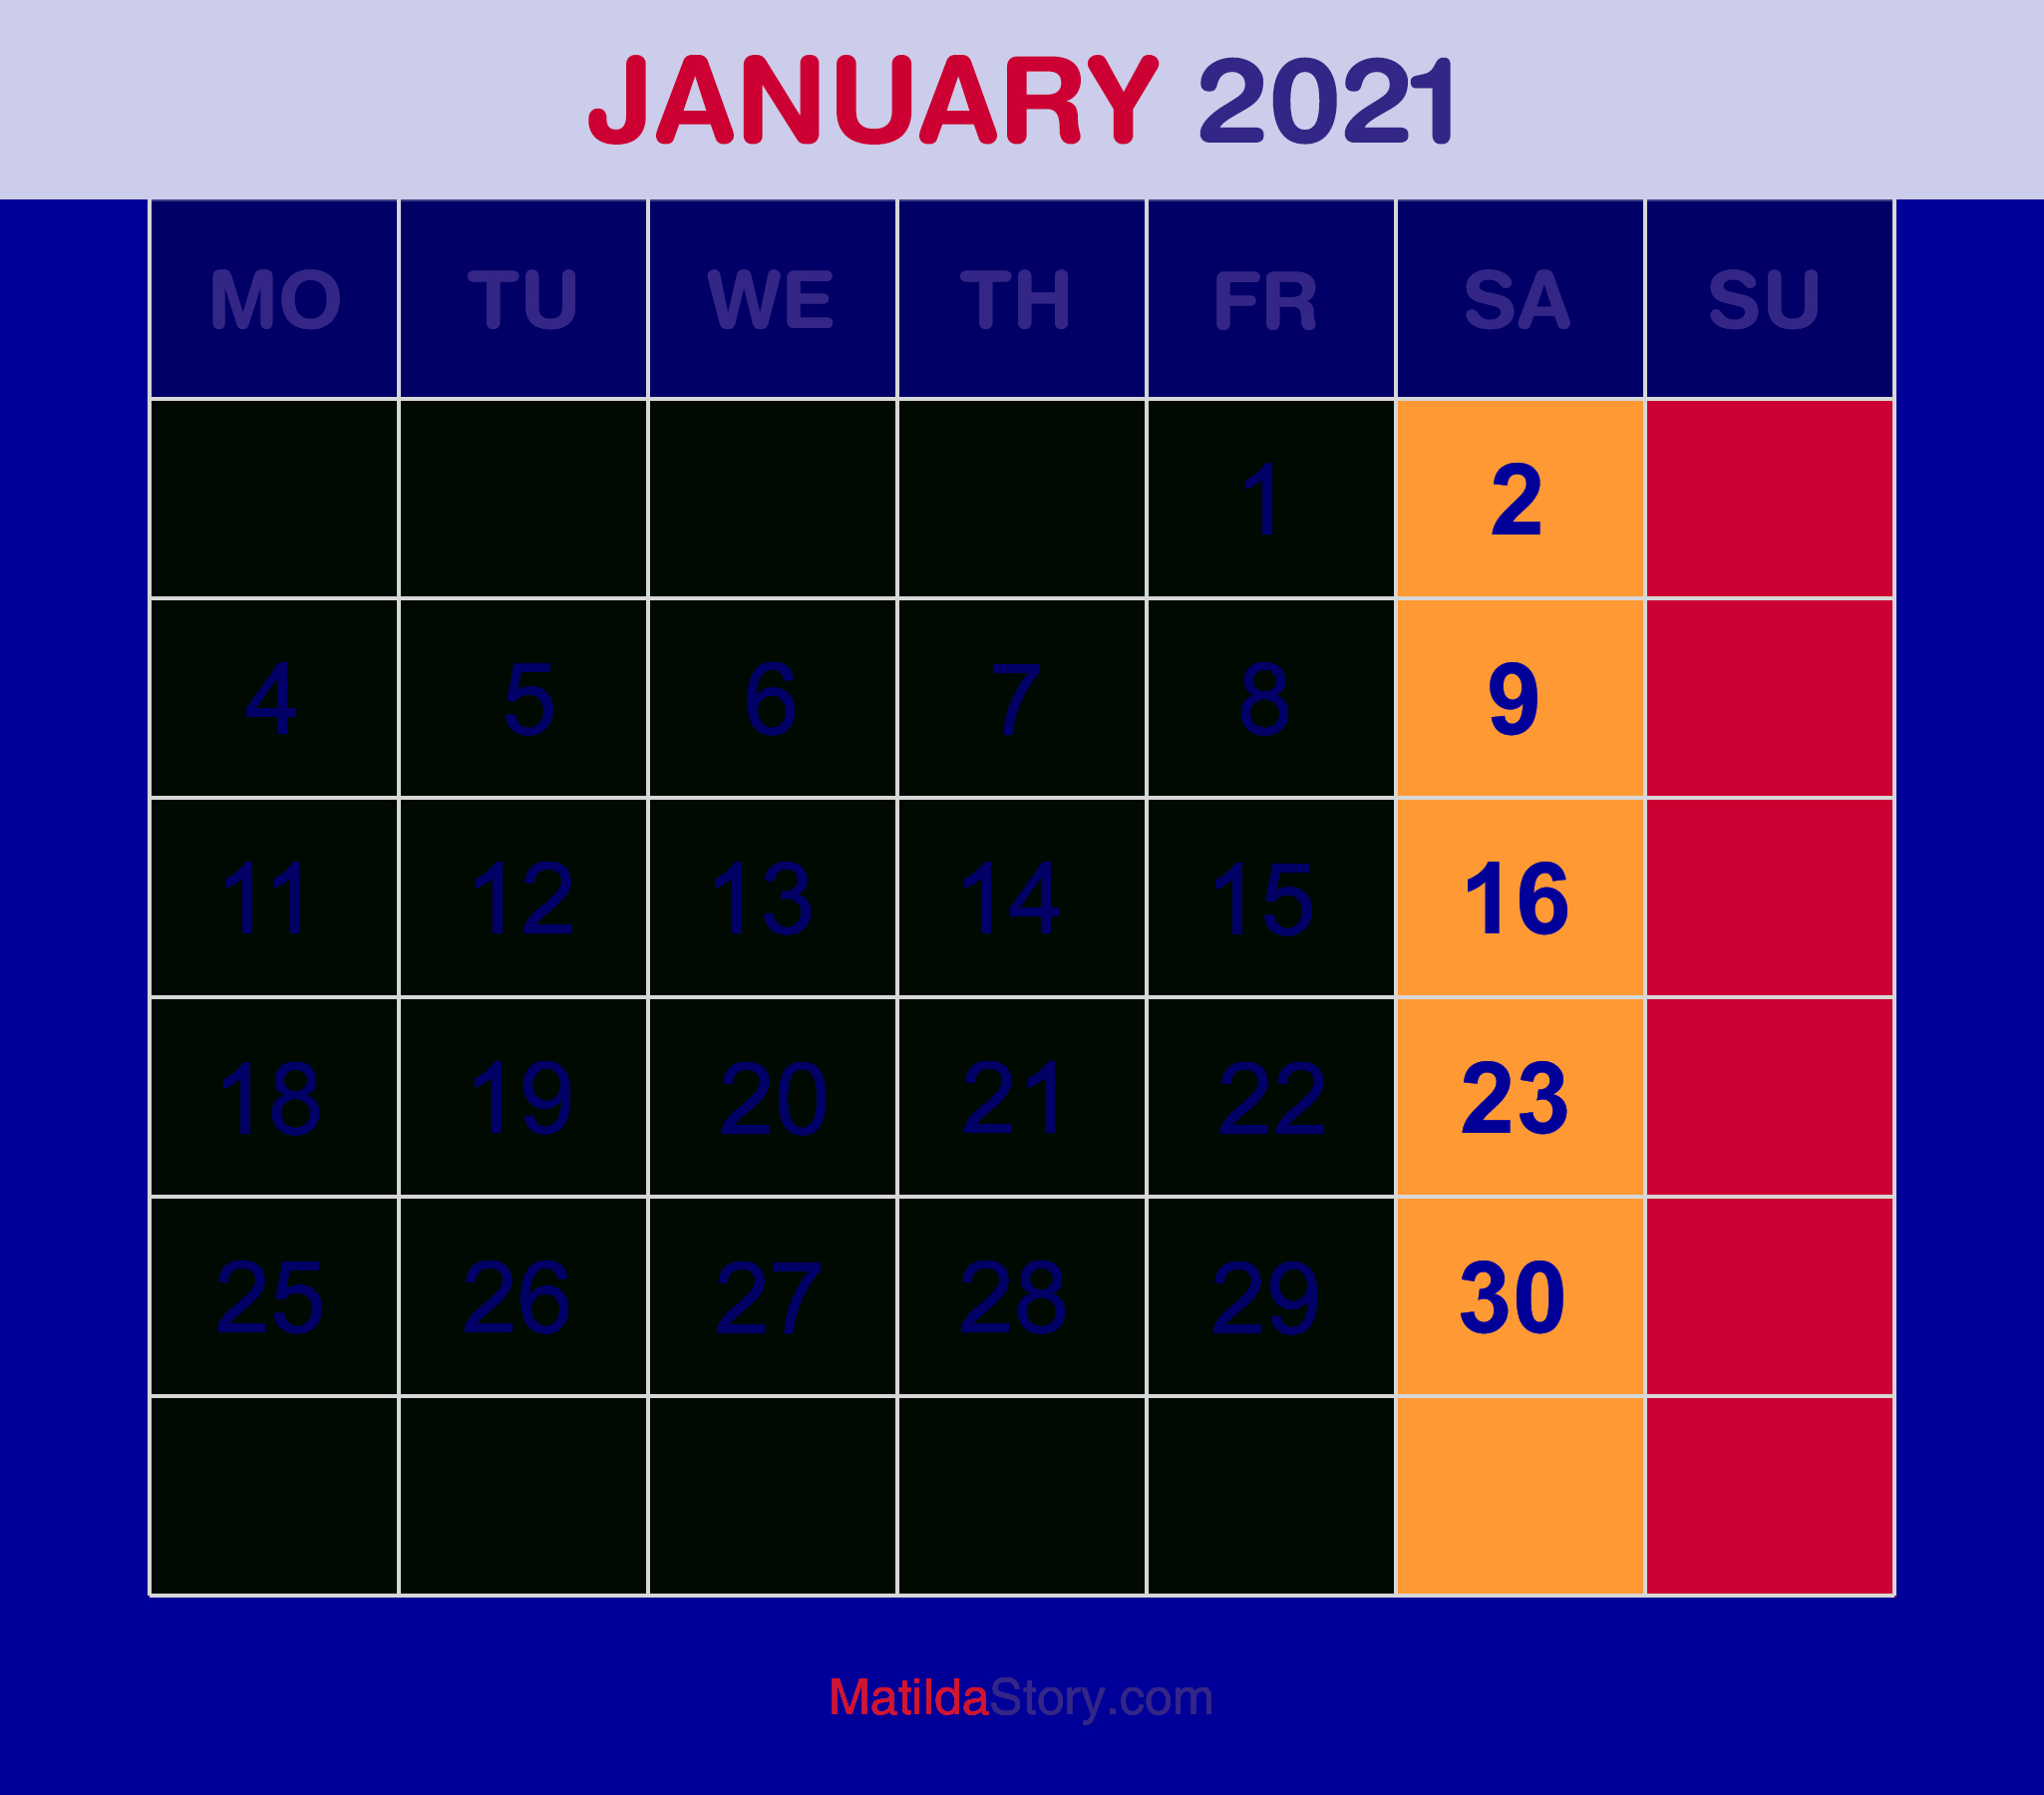 Download Calendar January 2021 : 65+ Printable Calendar